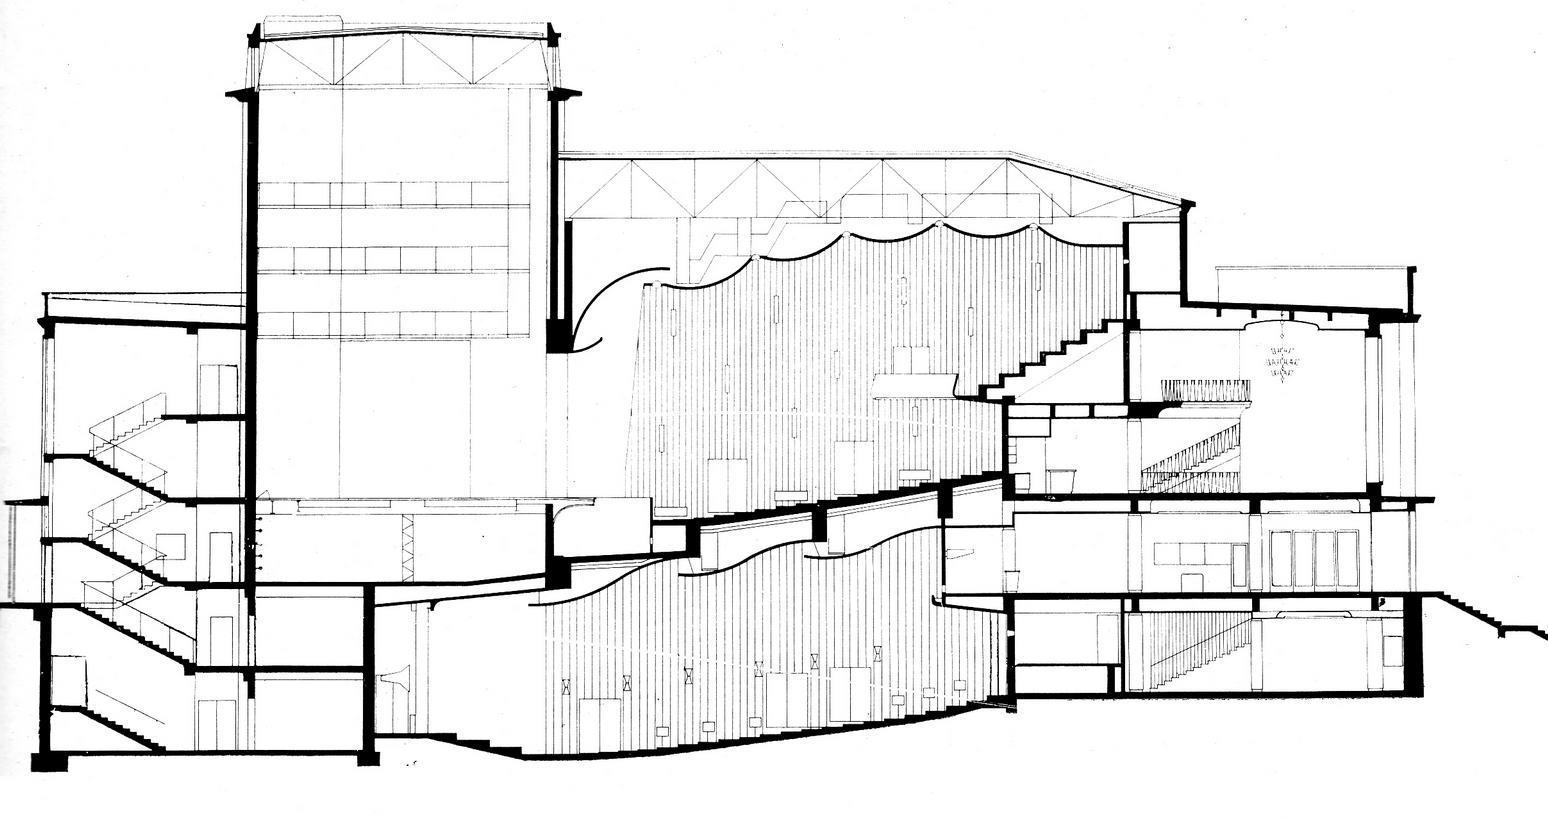 1980 honda xl500s wiring diagram 1980 honda cx500c wiring